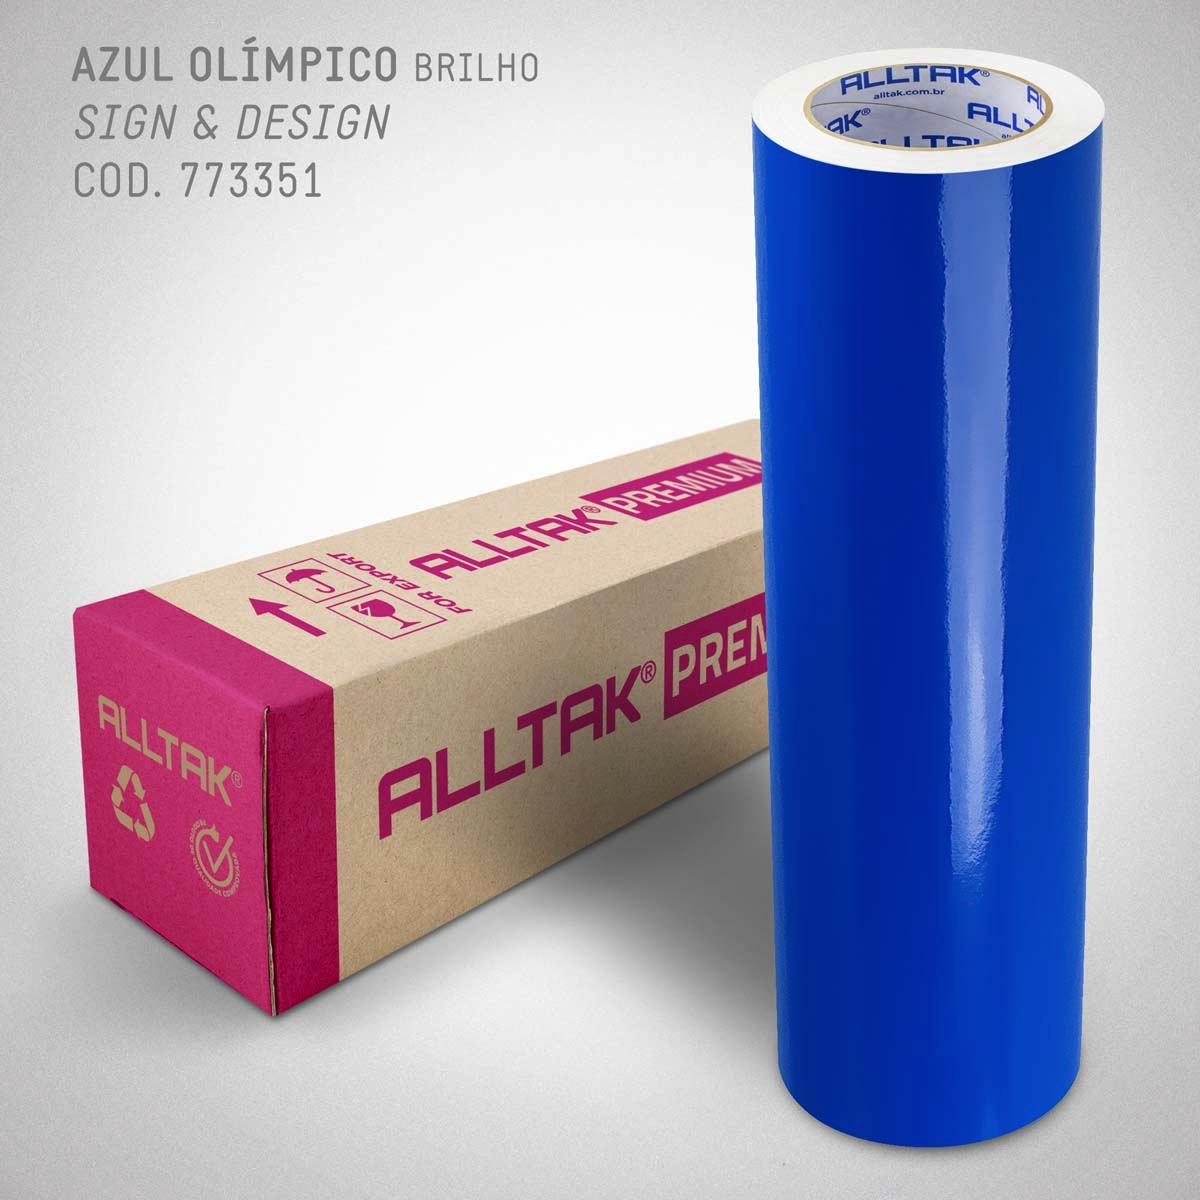 PREMIUM AZUL OLÍMPICO 0,08X1,22